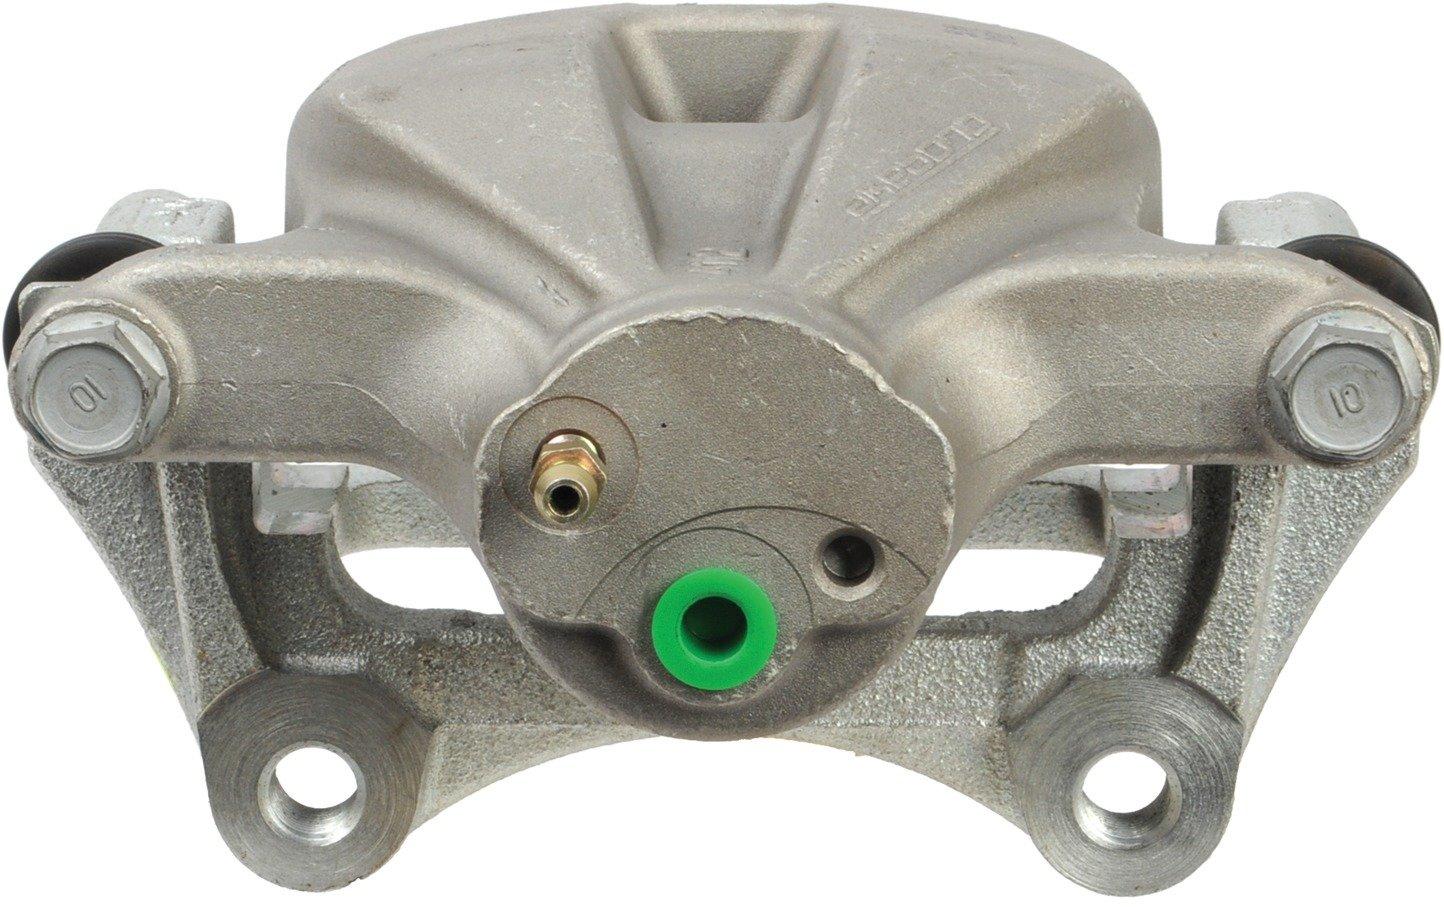 Cardone 19-B3350 Remanufactured Import Friction Ready (Unloaded) Brake Caliper